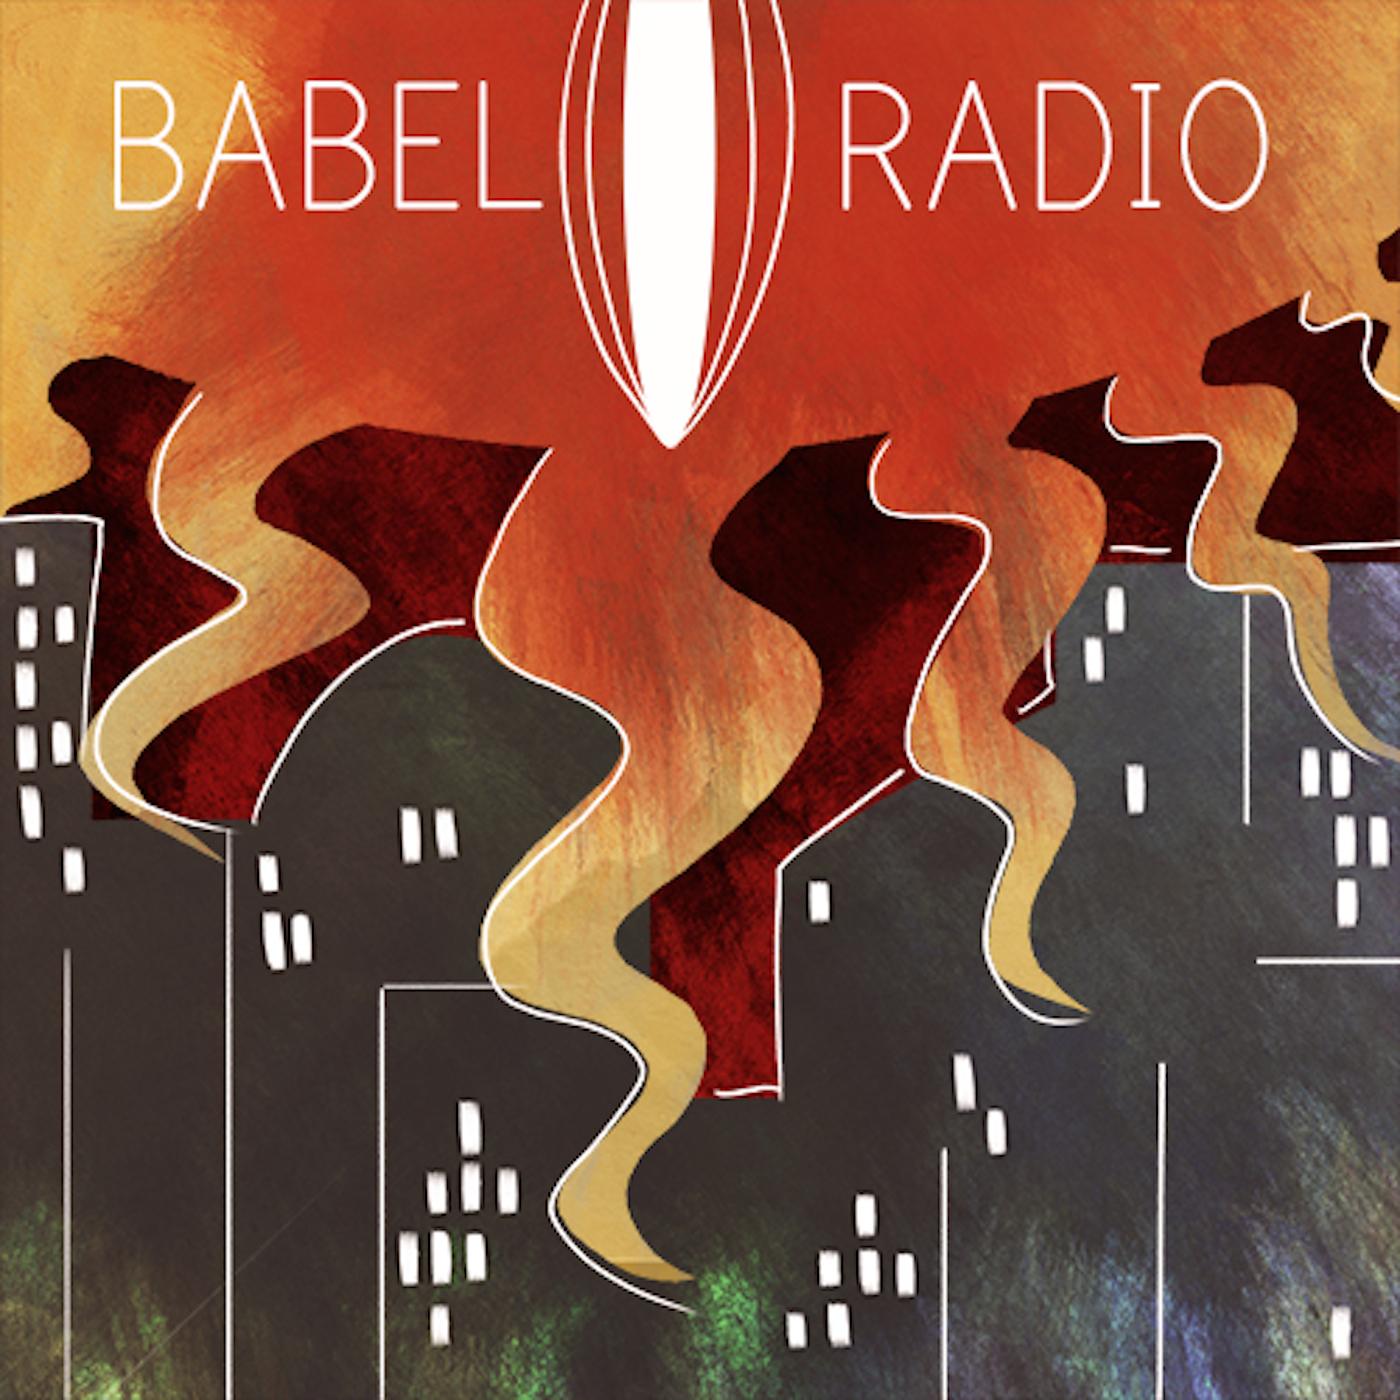 Babel Radio